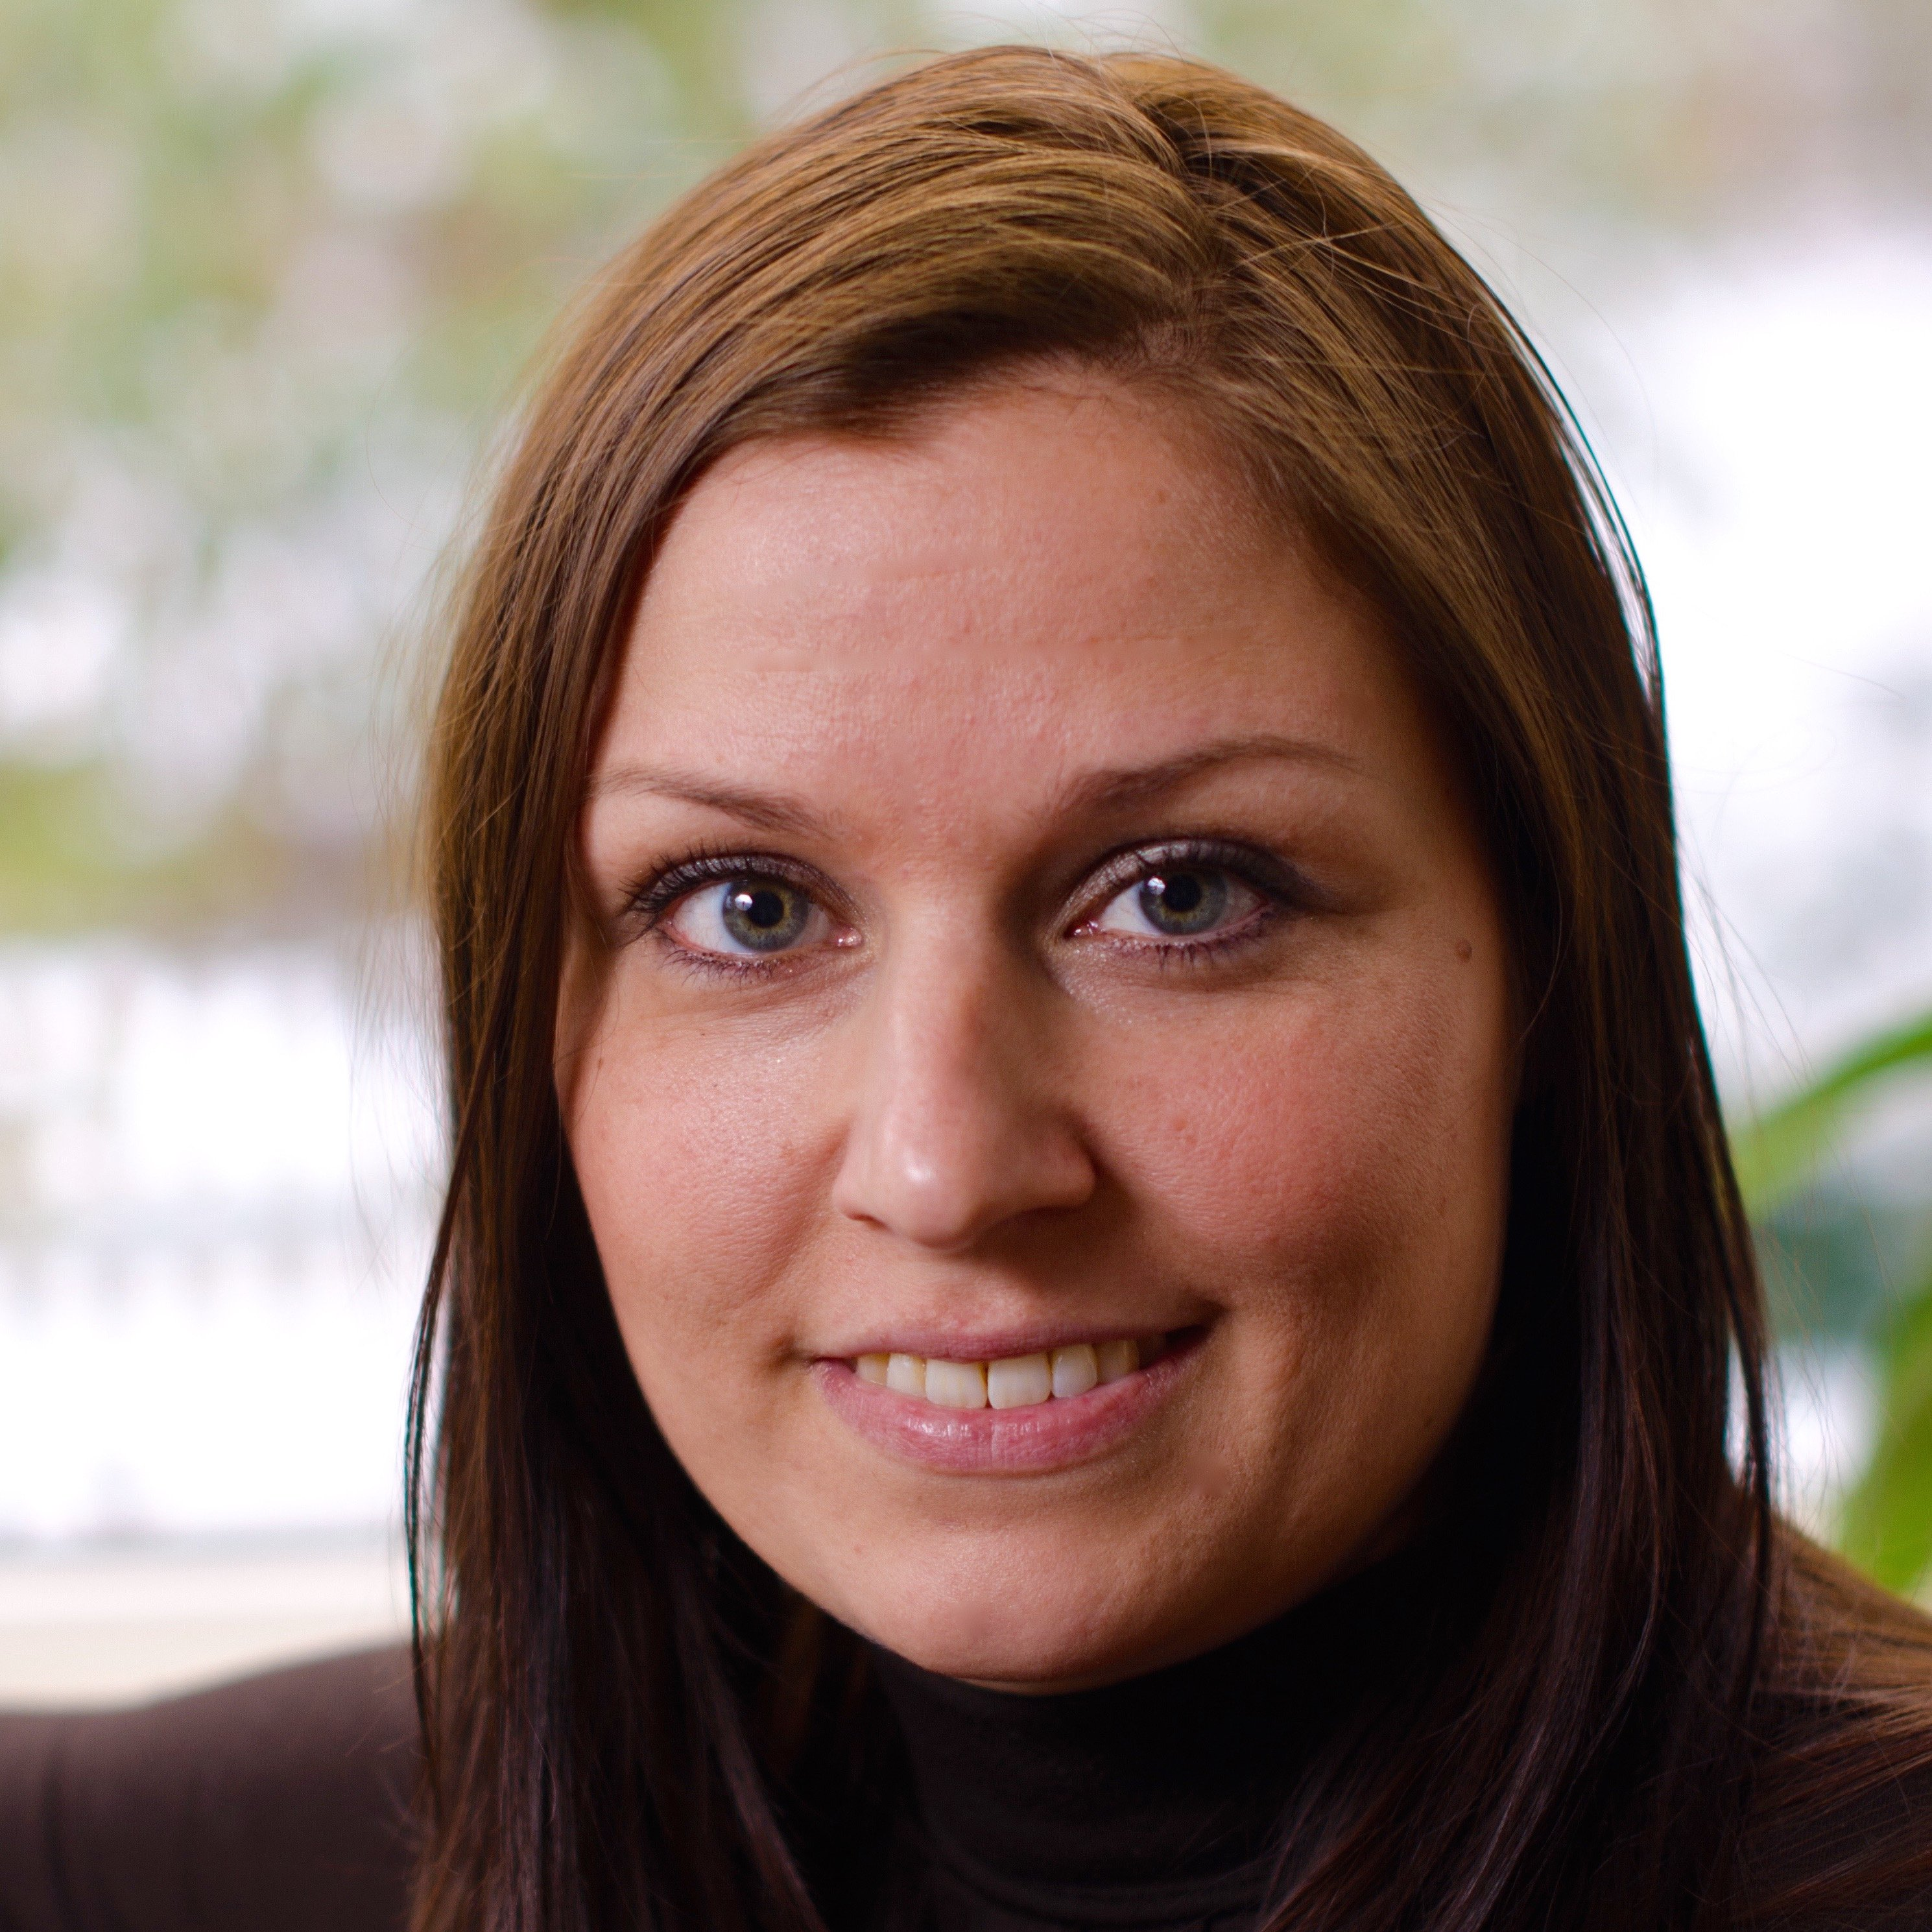 Anita Eerland